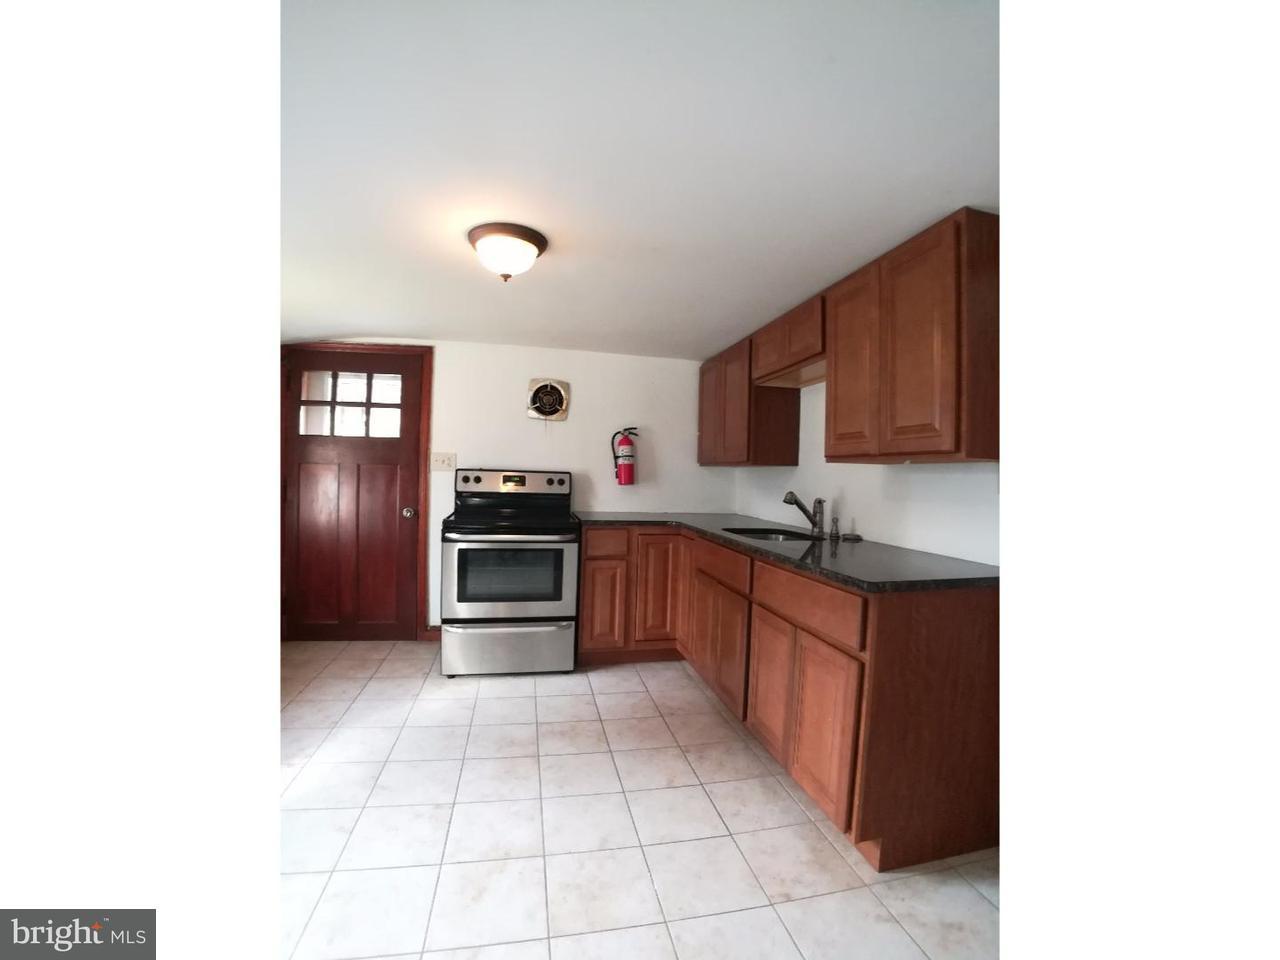 Duplex for Rent at 814 BUSH ST #2 Bridgeport, Pennsylvania 19405 United States